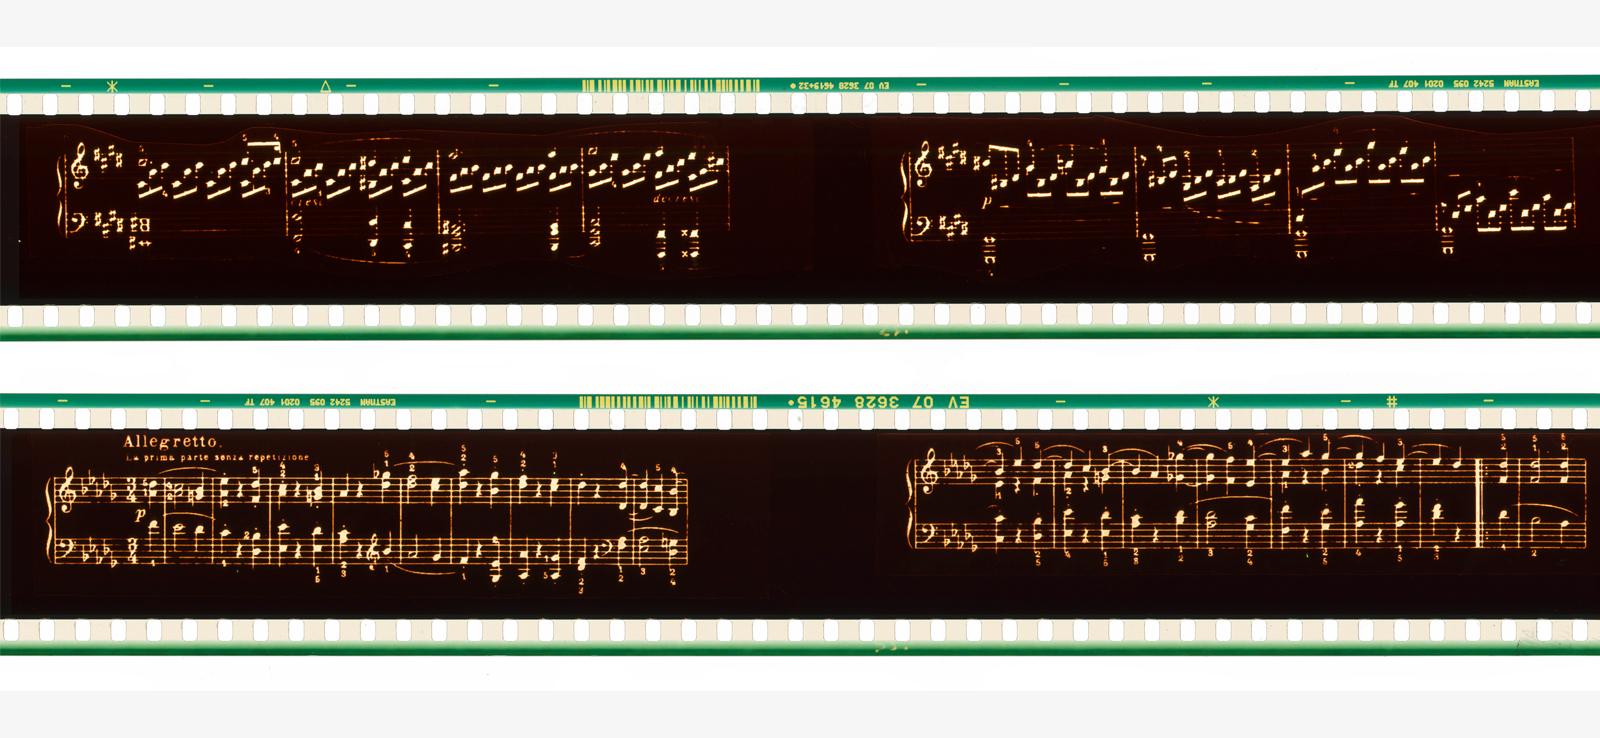 Antoni-Pinent-film-Musica-visual-en-vertical-cameraless-reinterpretations